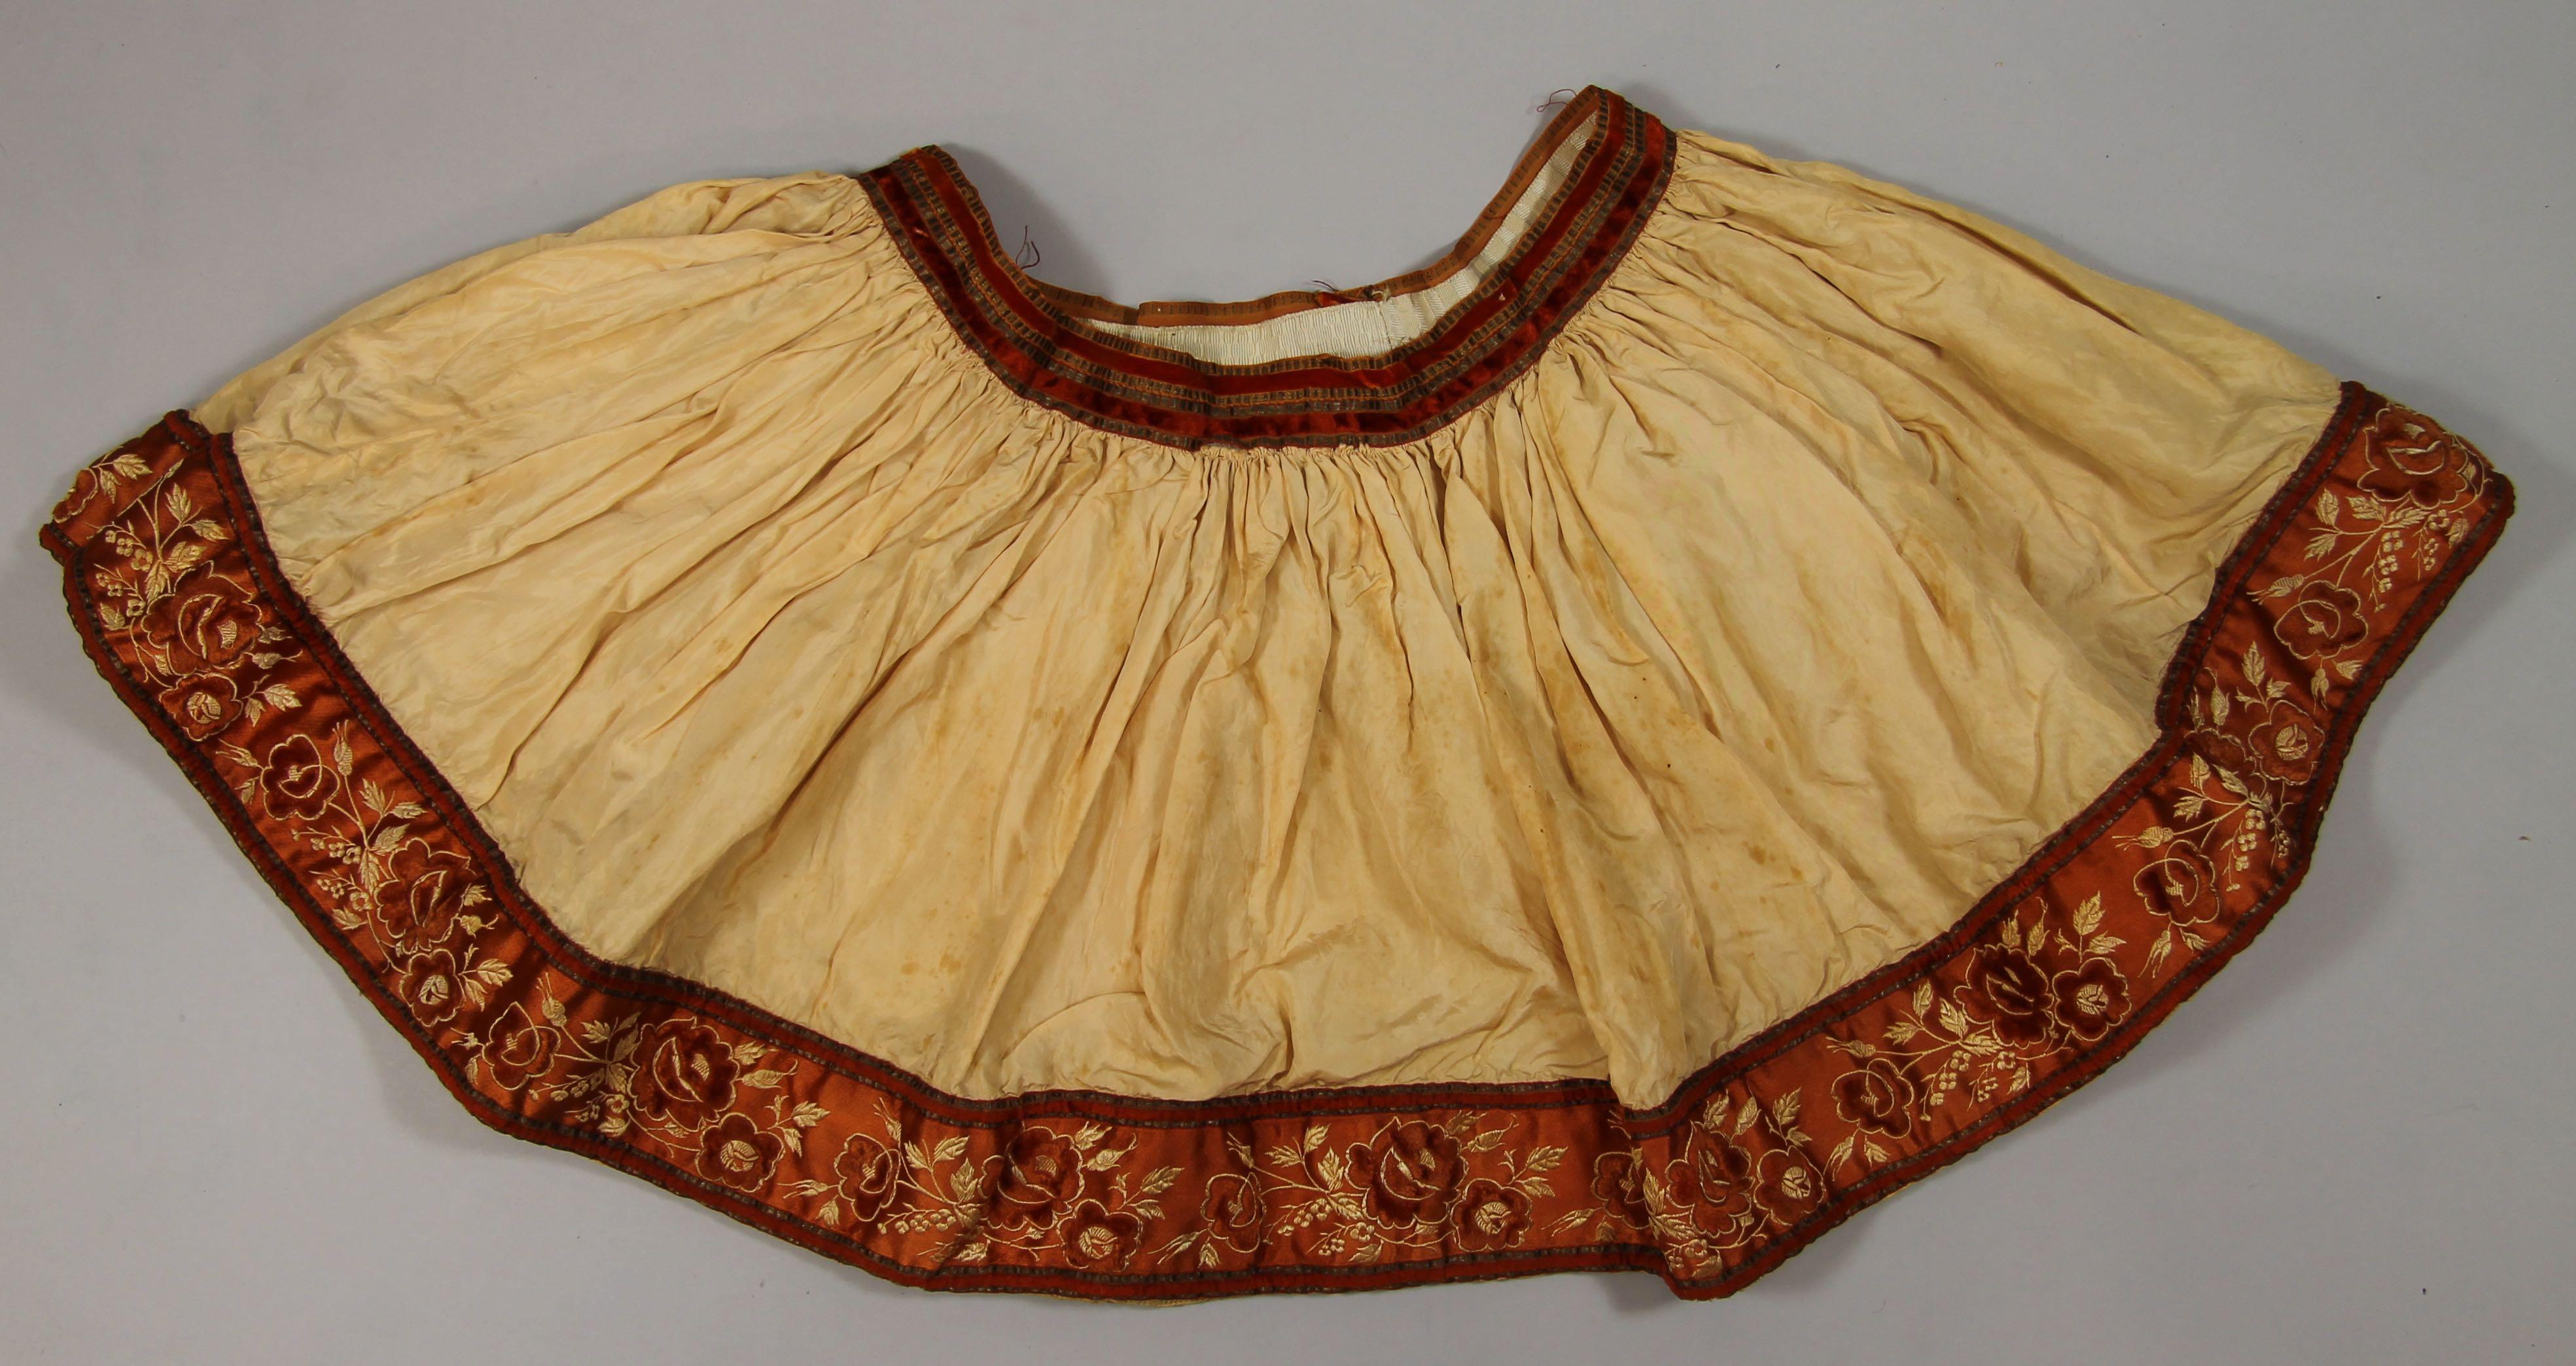 Fustanella [A man's pleated skirt]